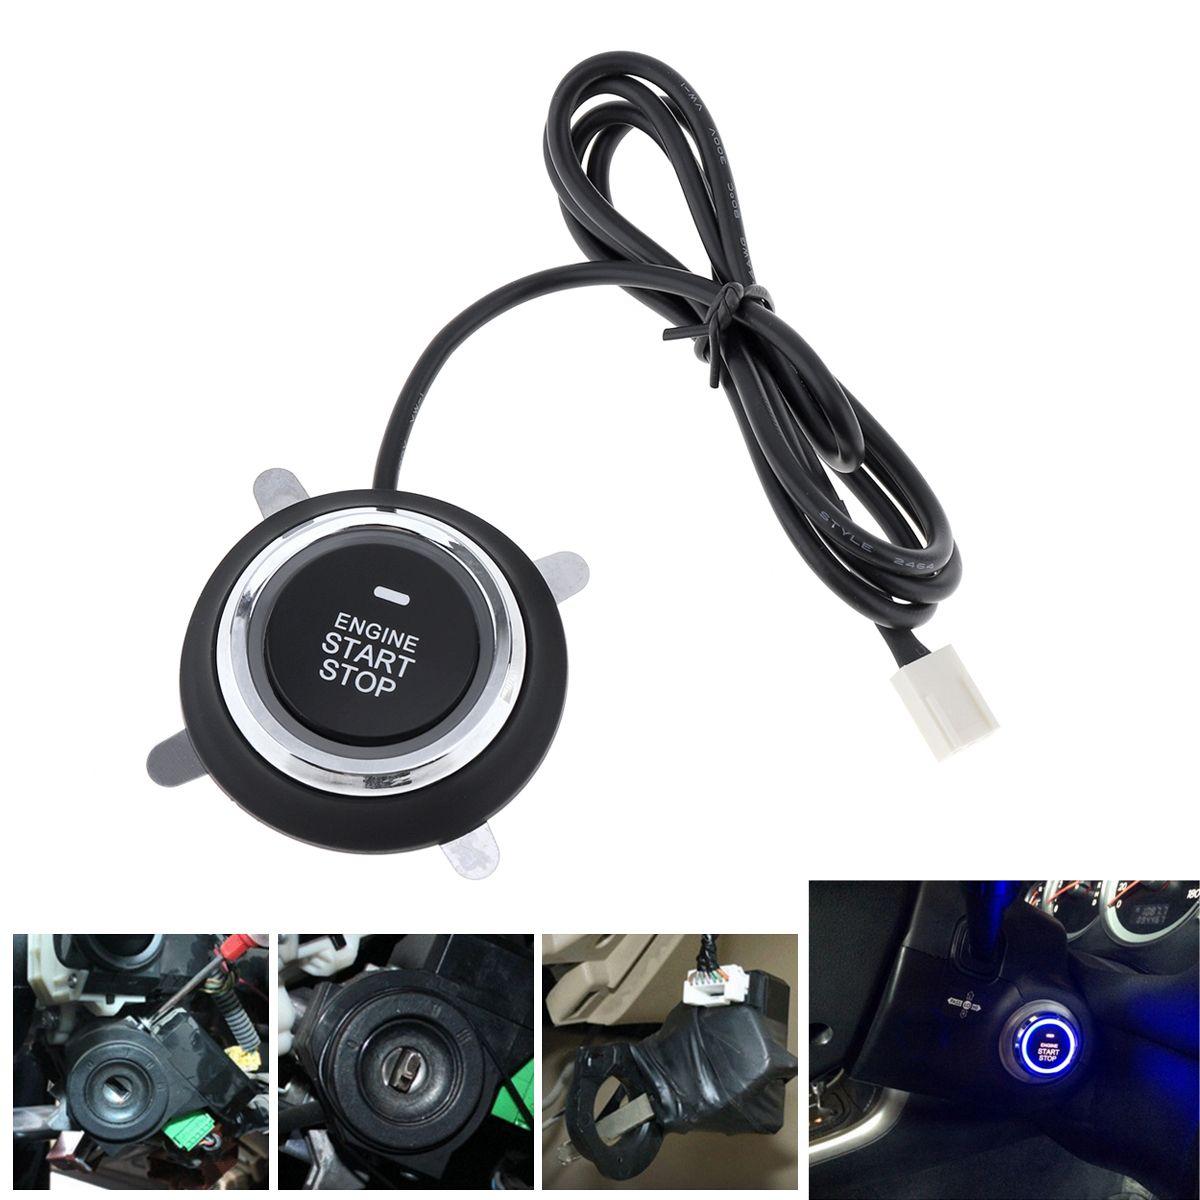 Universal 12V Auto RFID Car Alarm System & Warded lock Anti-theft Push Start System CAL_10D